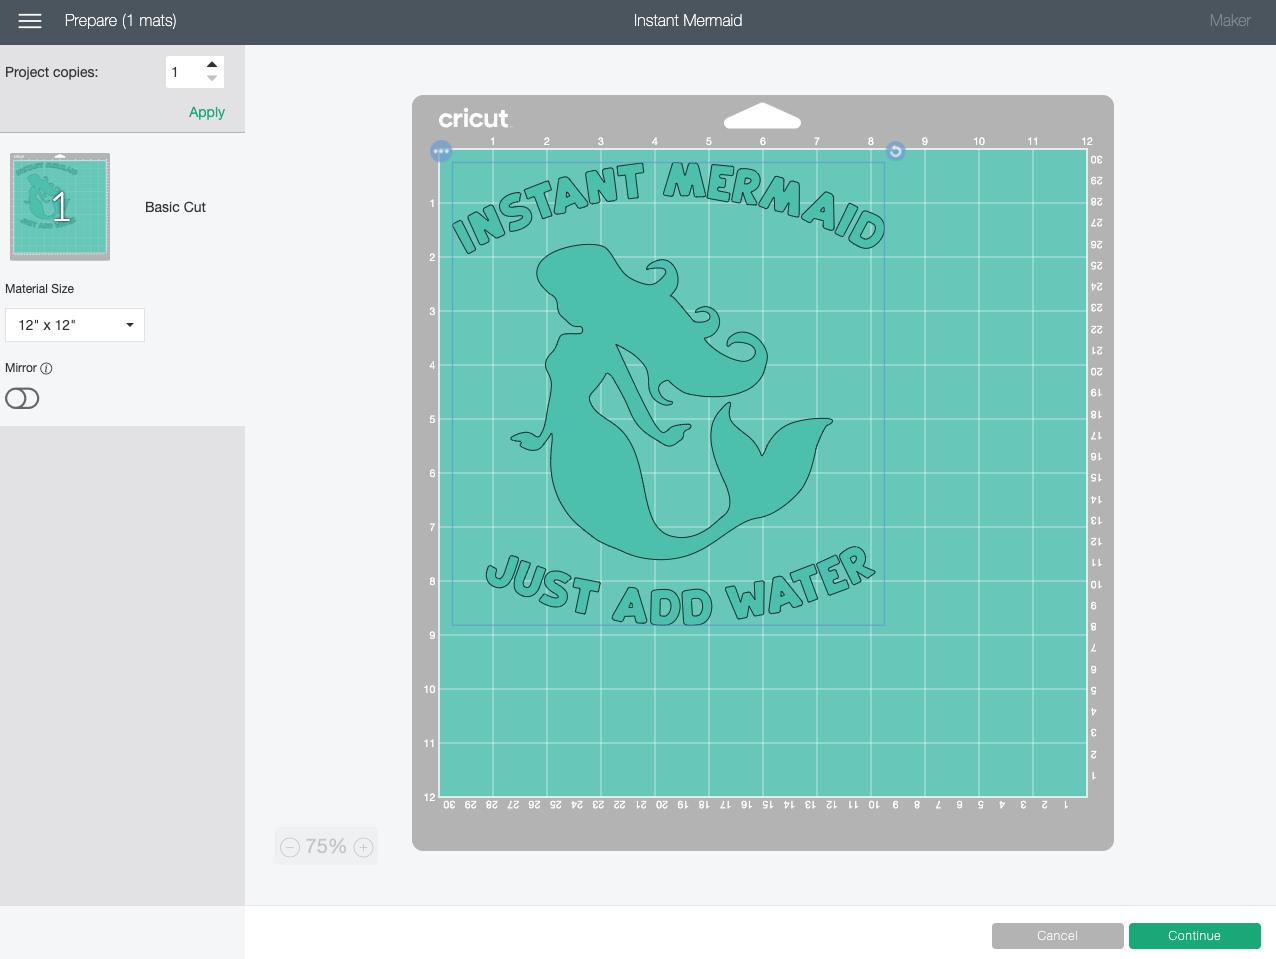 Cricut Design Space: Instant Mermaid in Prepare Screen